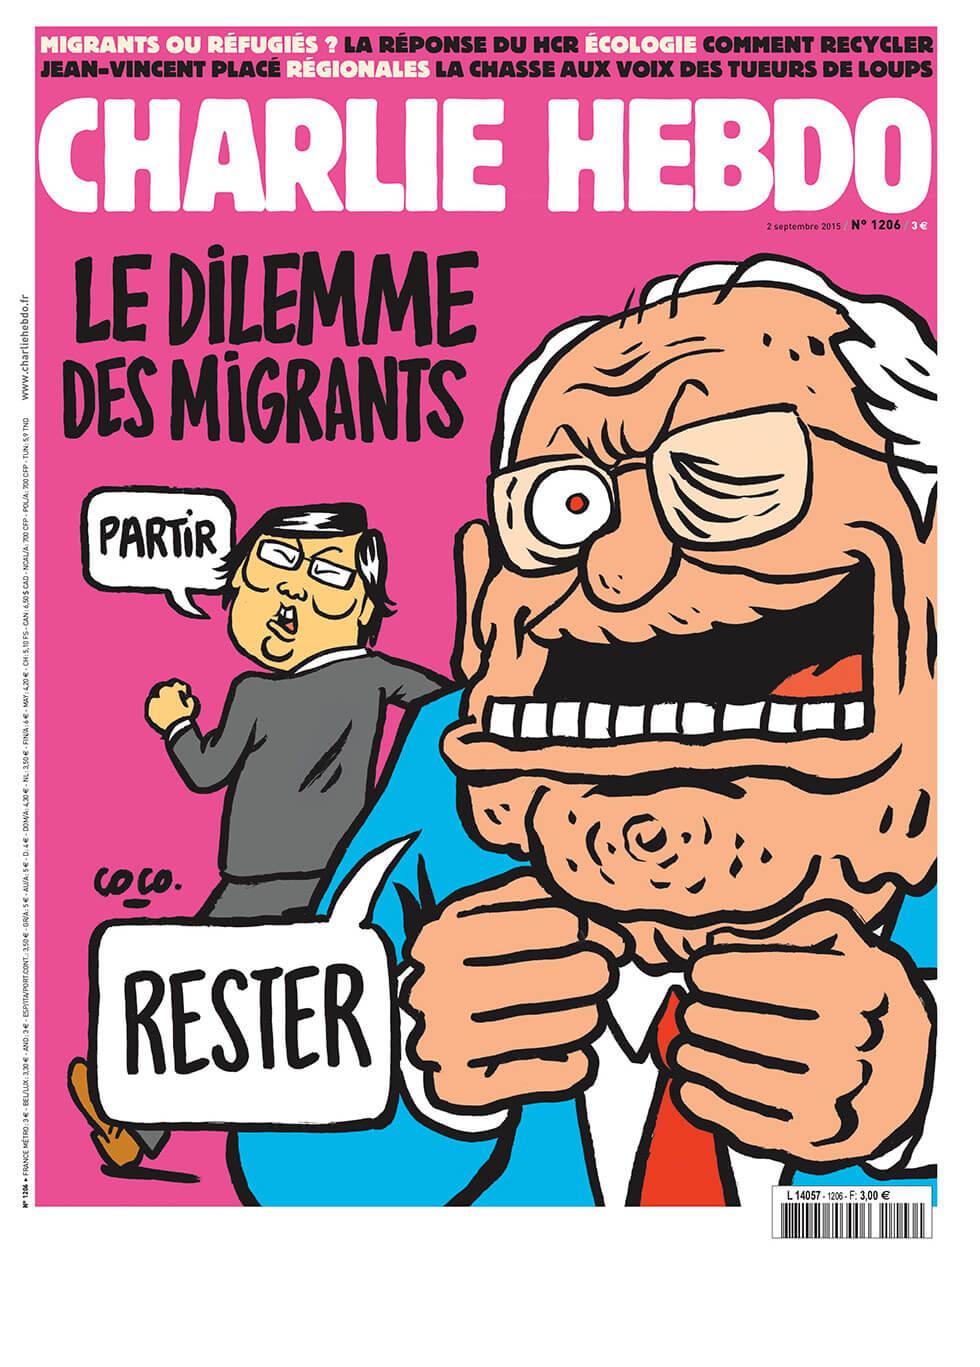 Charlie Hebdo n°1206 --- 2 septembre 2015